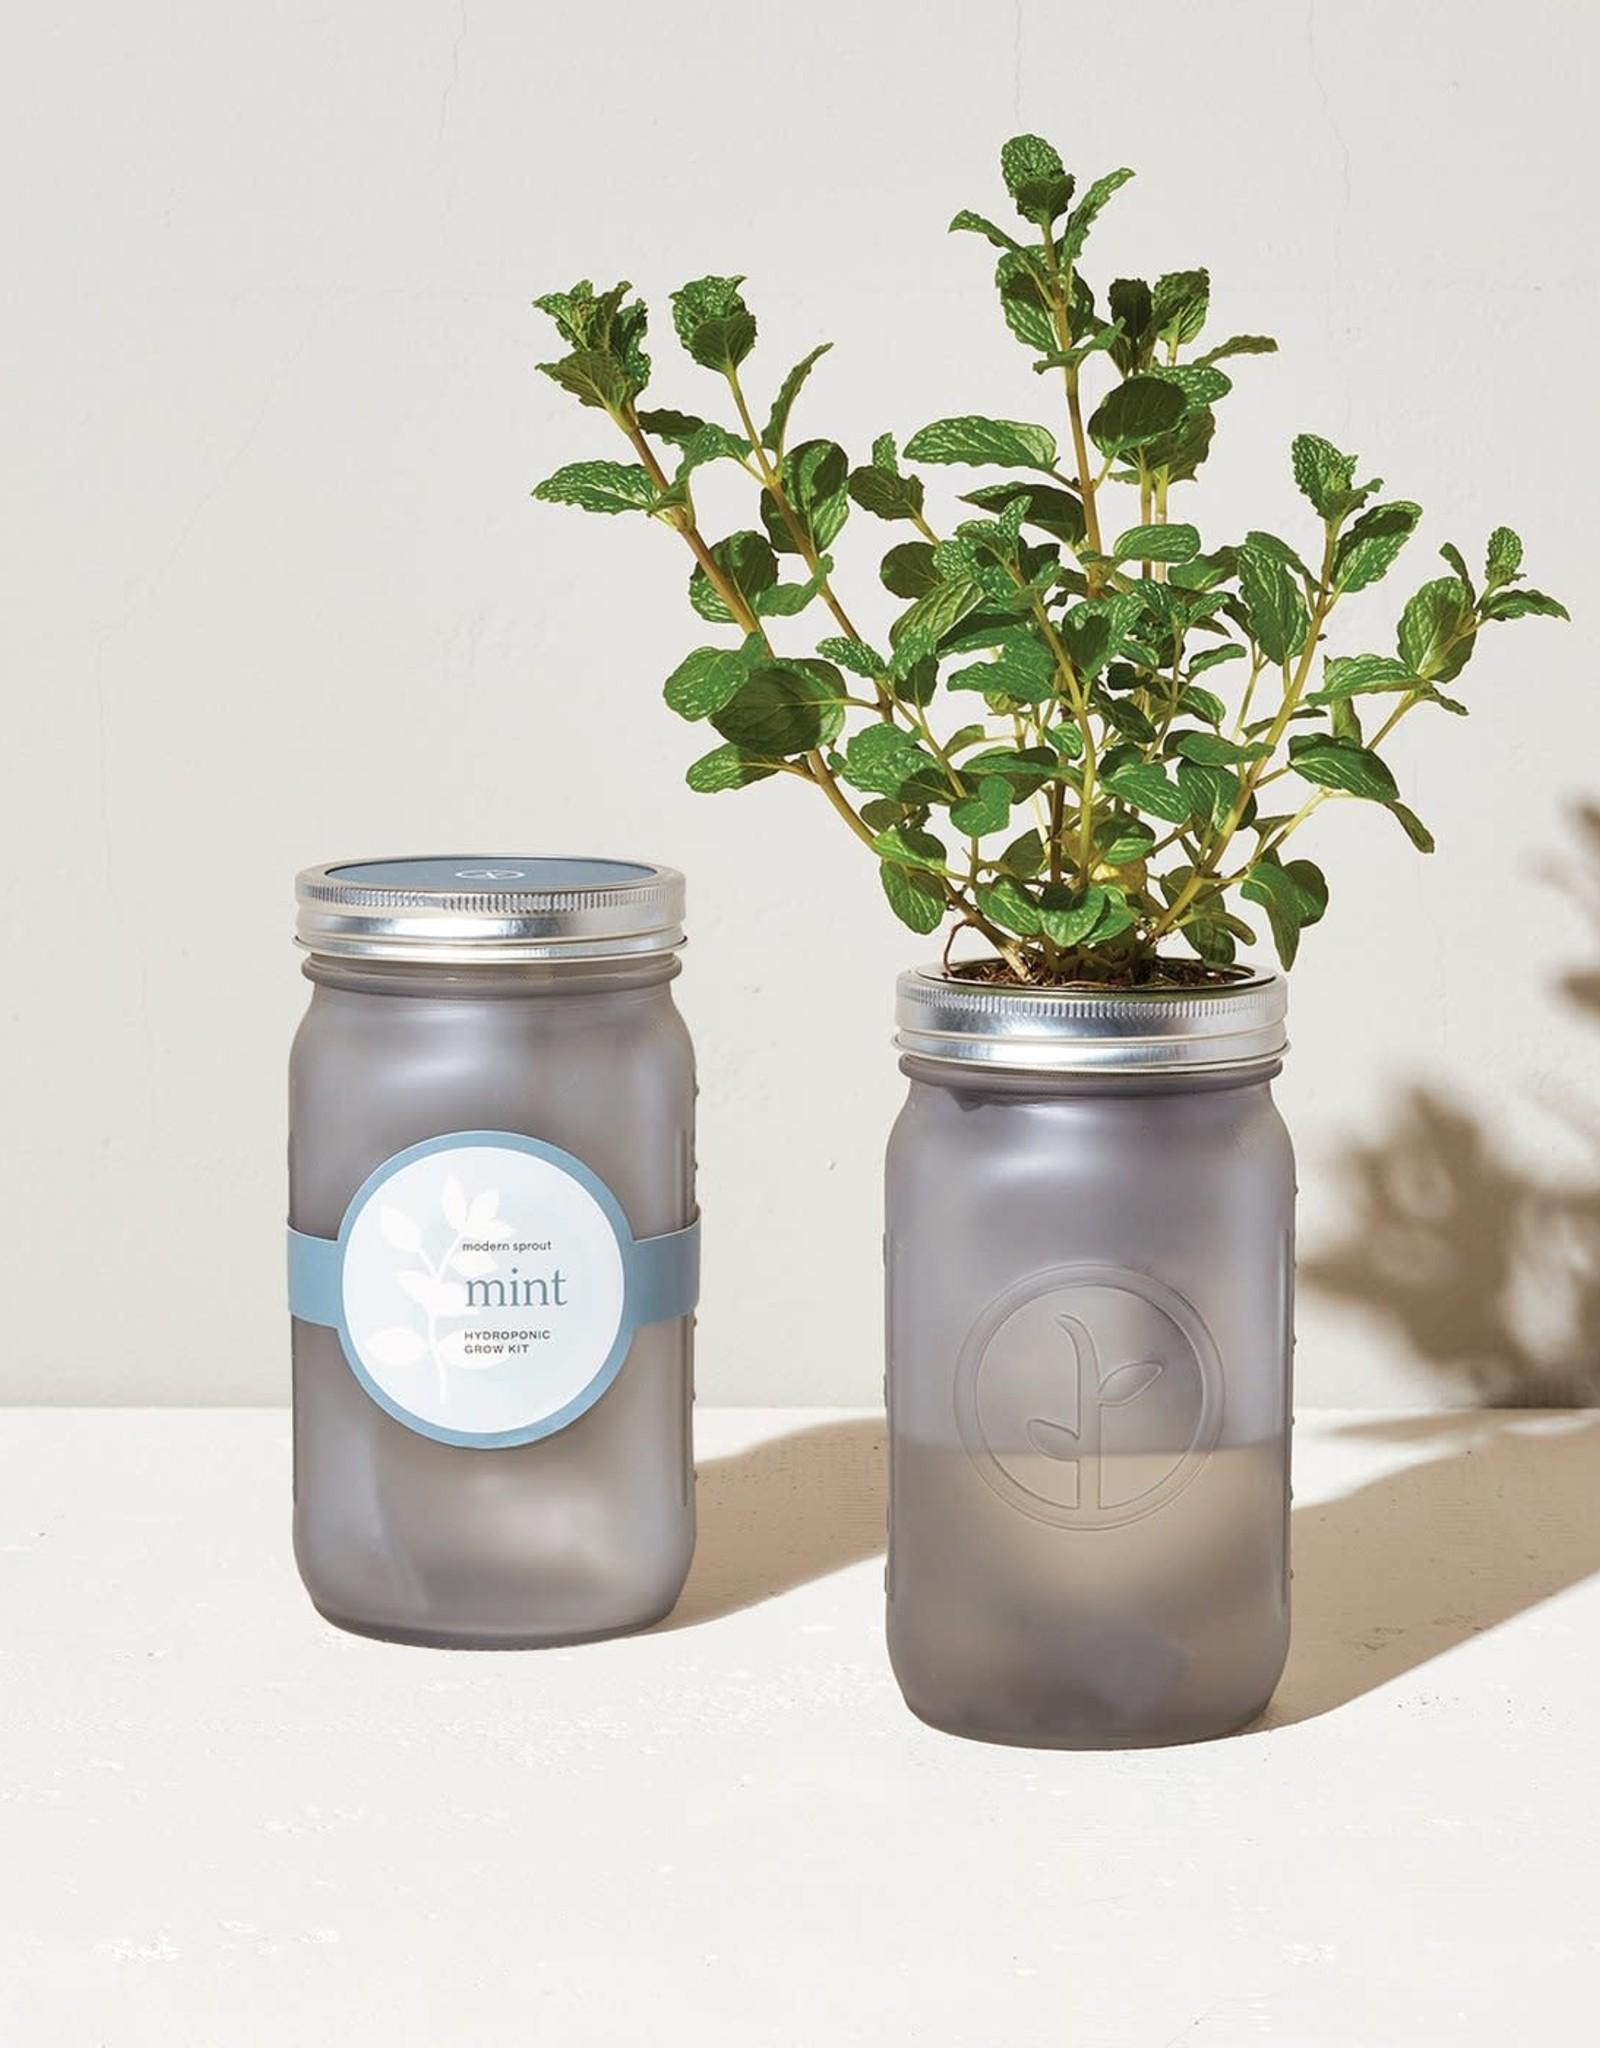 Modern Sprout LLC Self Watering Garden Jar Kit